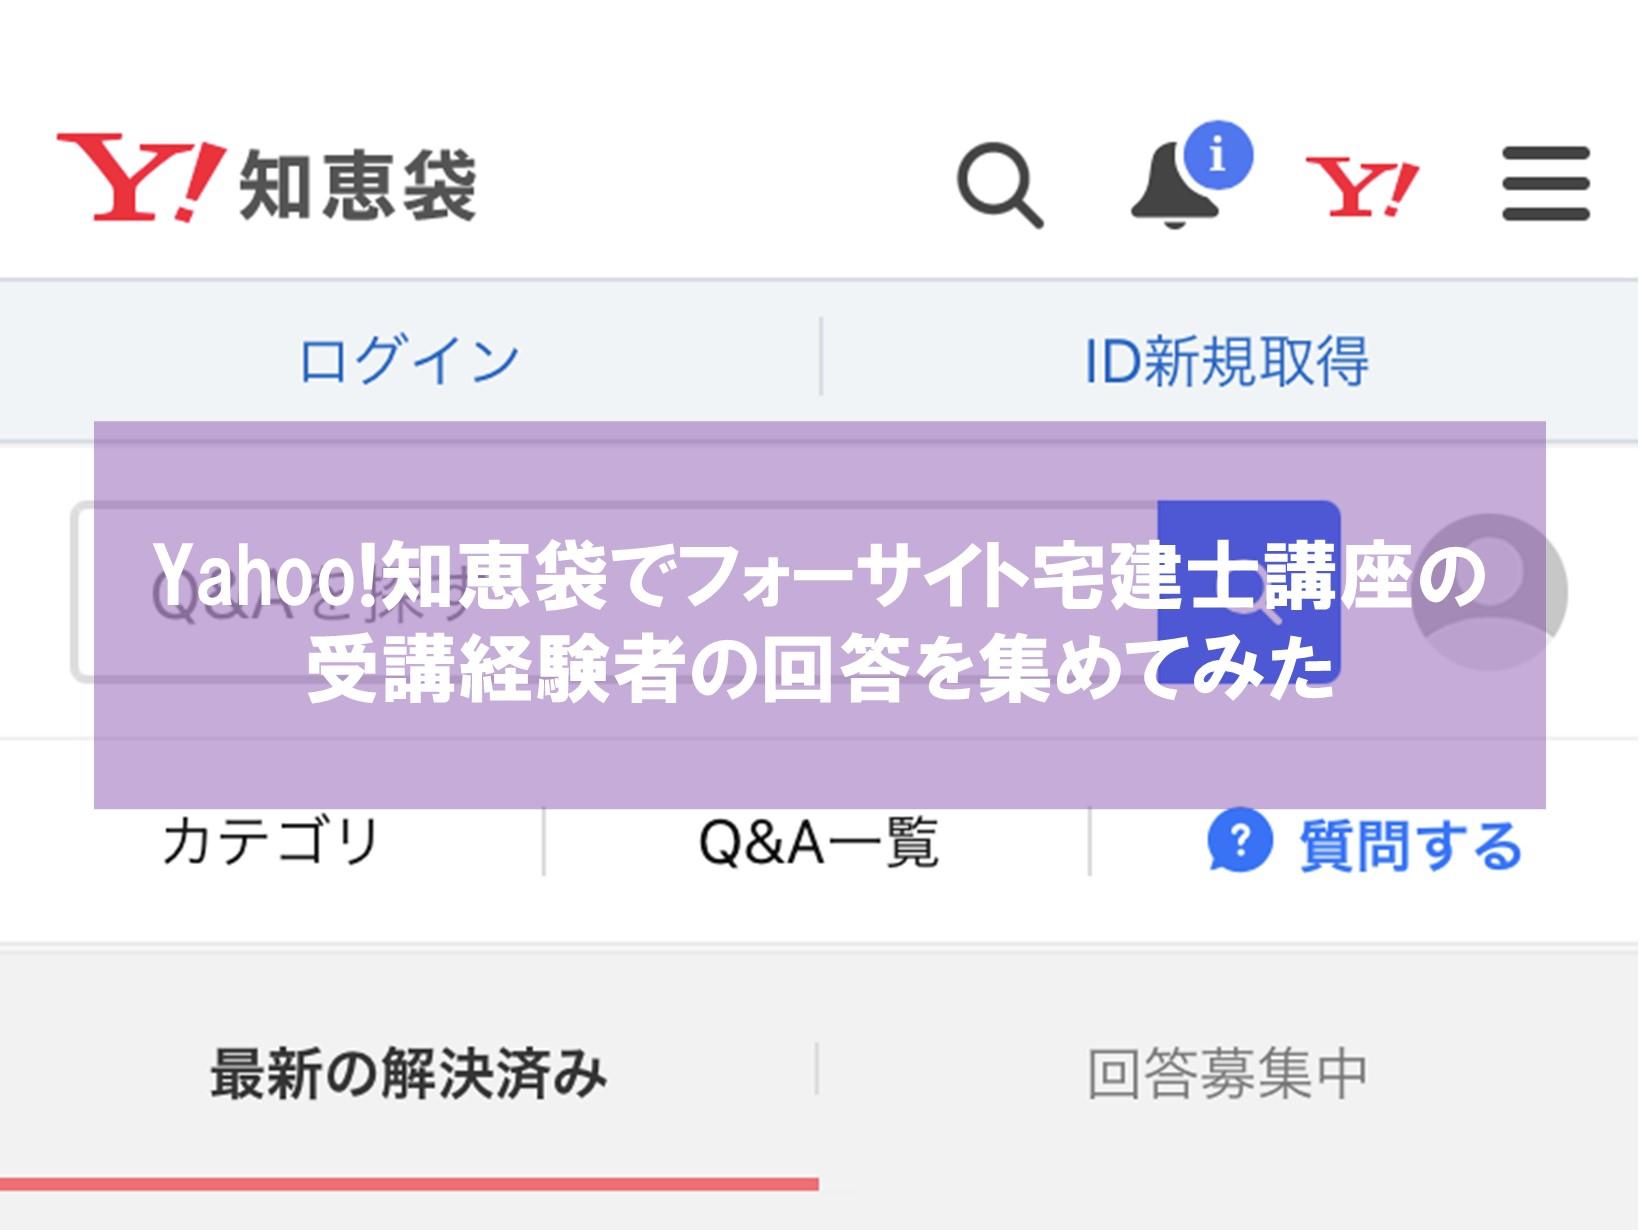 Yahoo!知恵袋でフォーサイト宅建士講座の受講経験者の回答を集めてみた